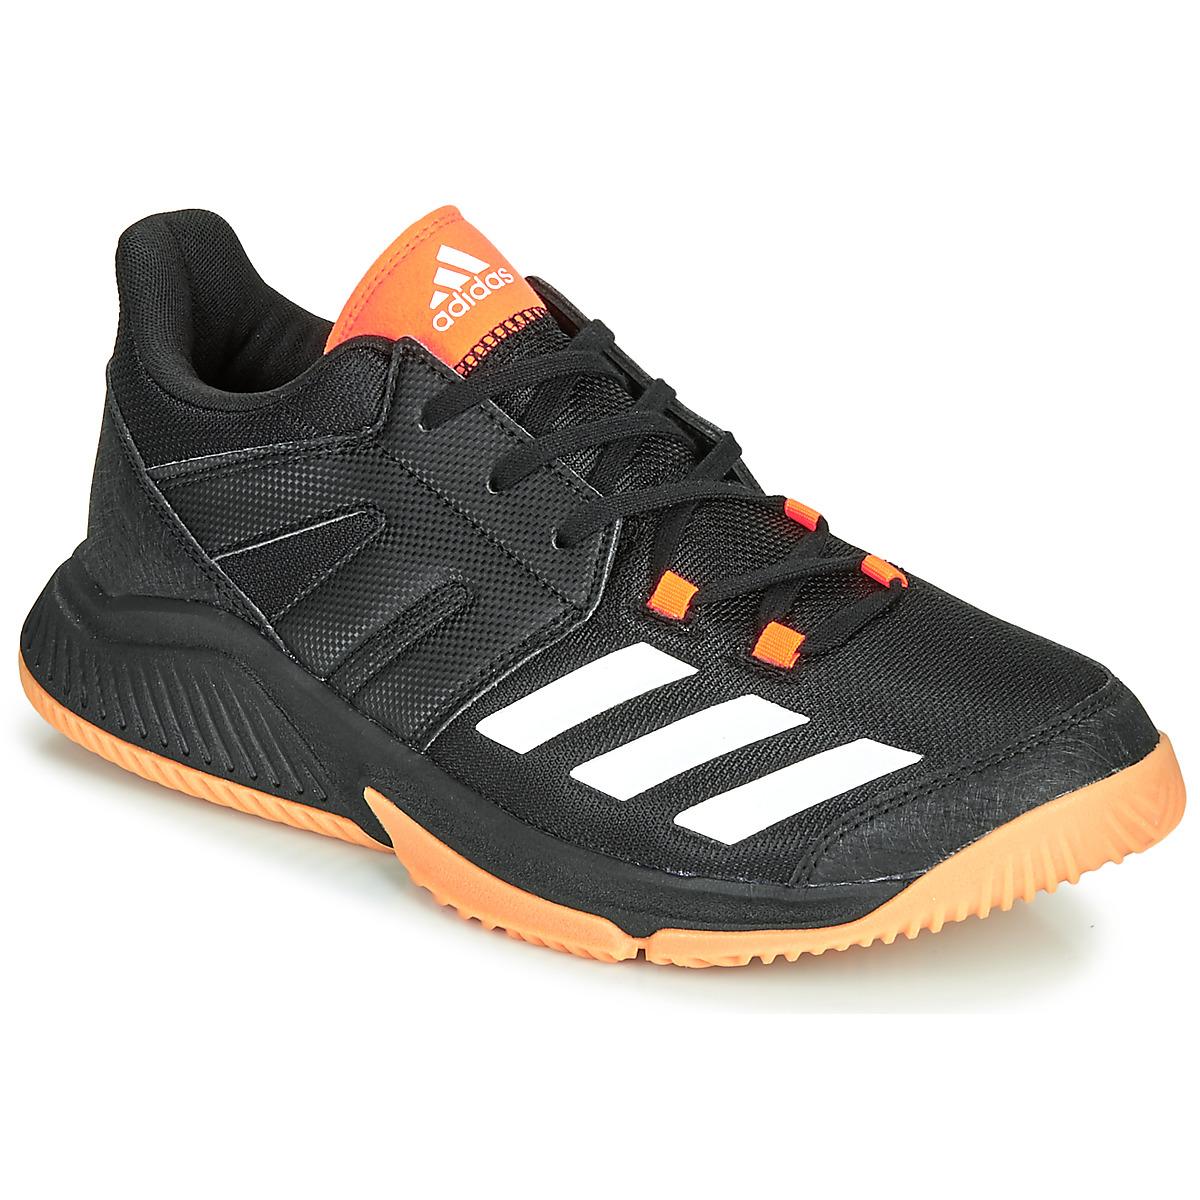 adidas badminton trainers off 70% - www.usushimd.com